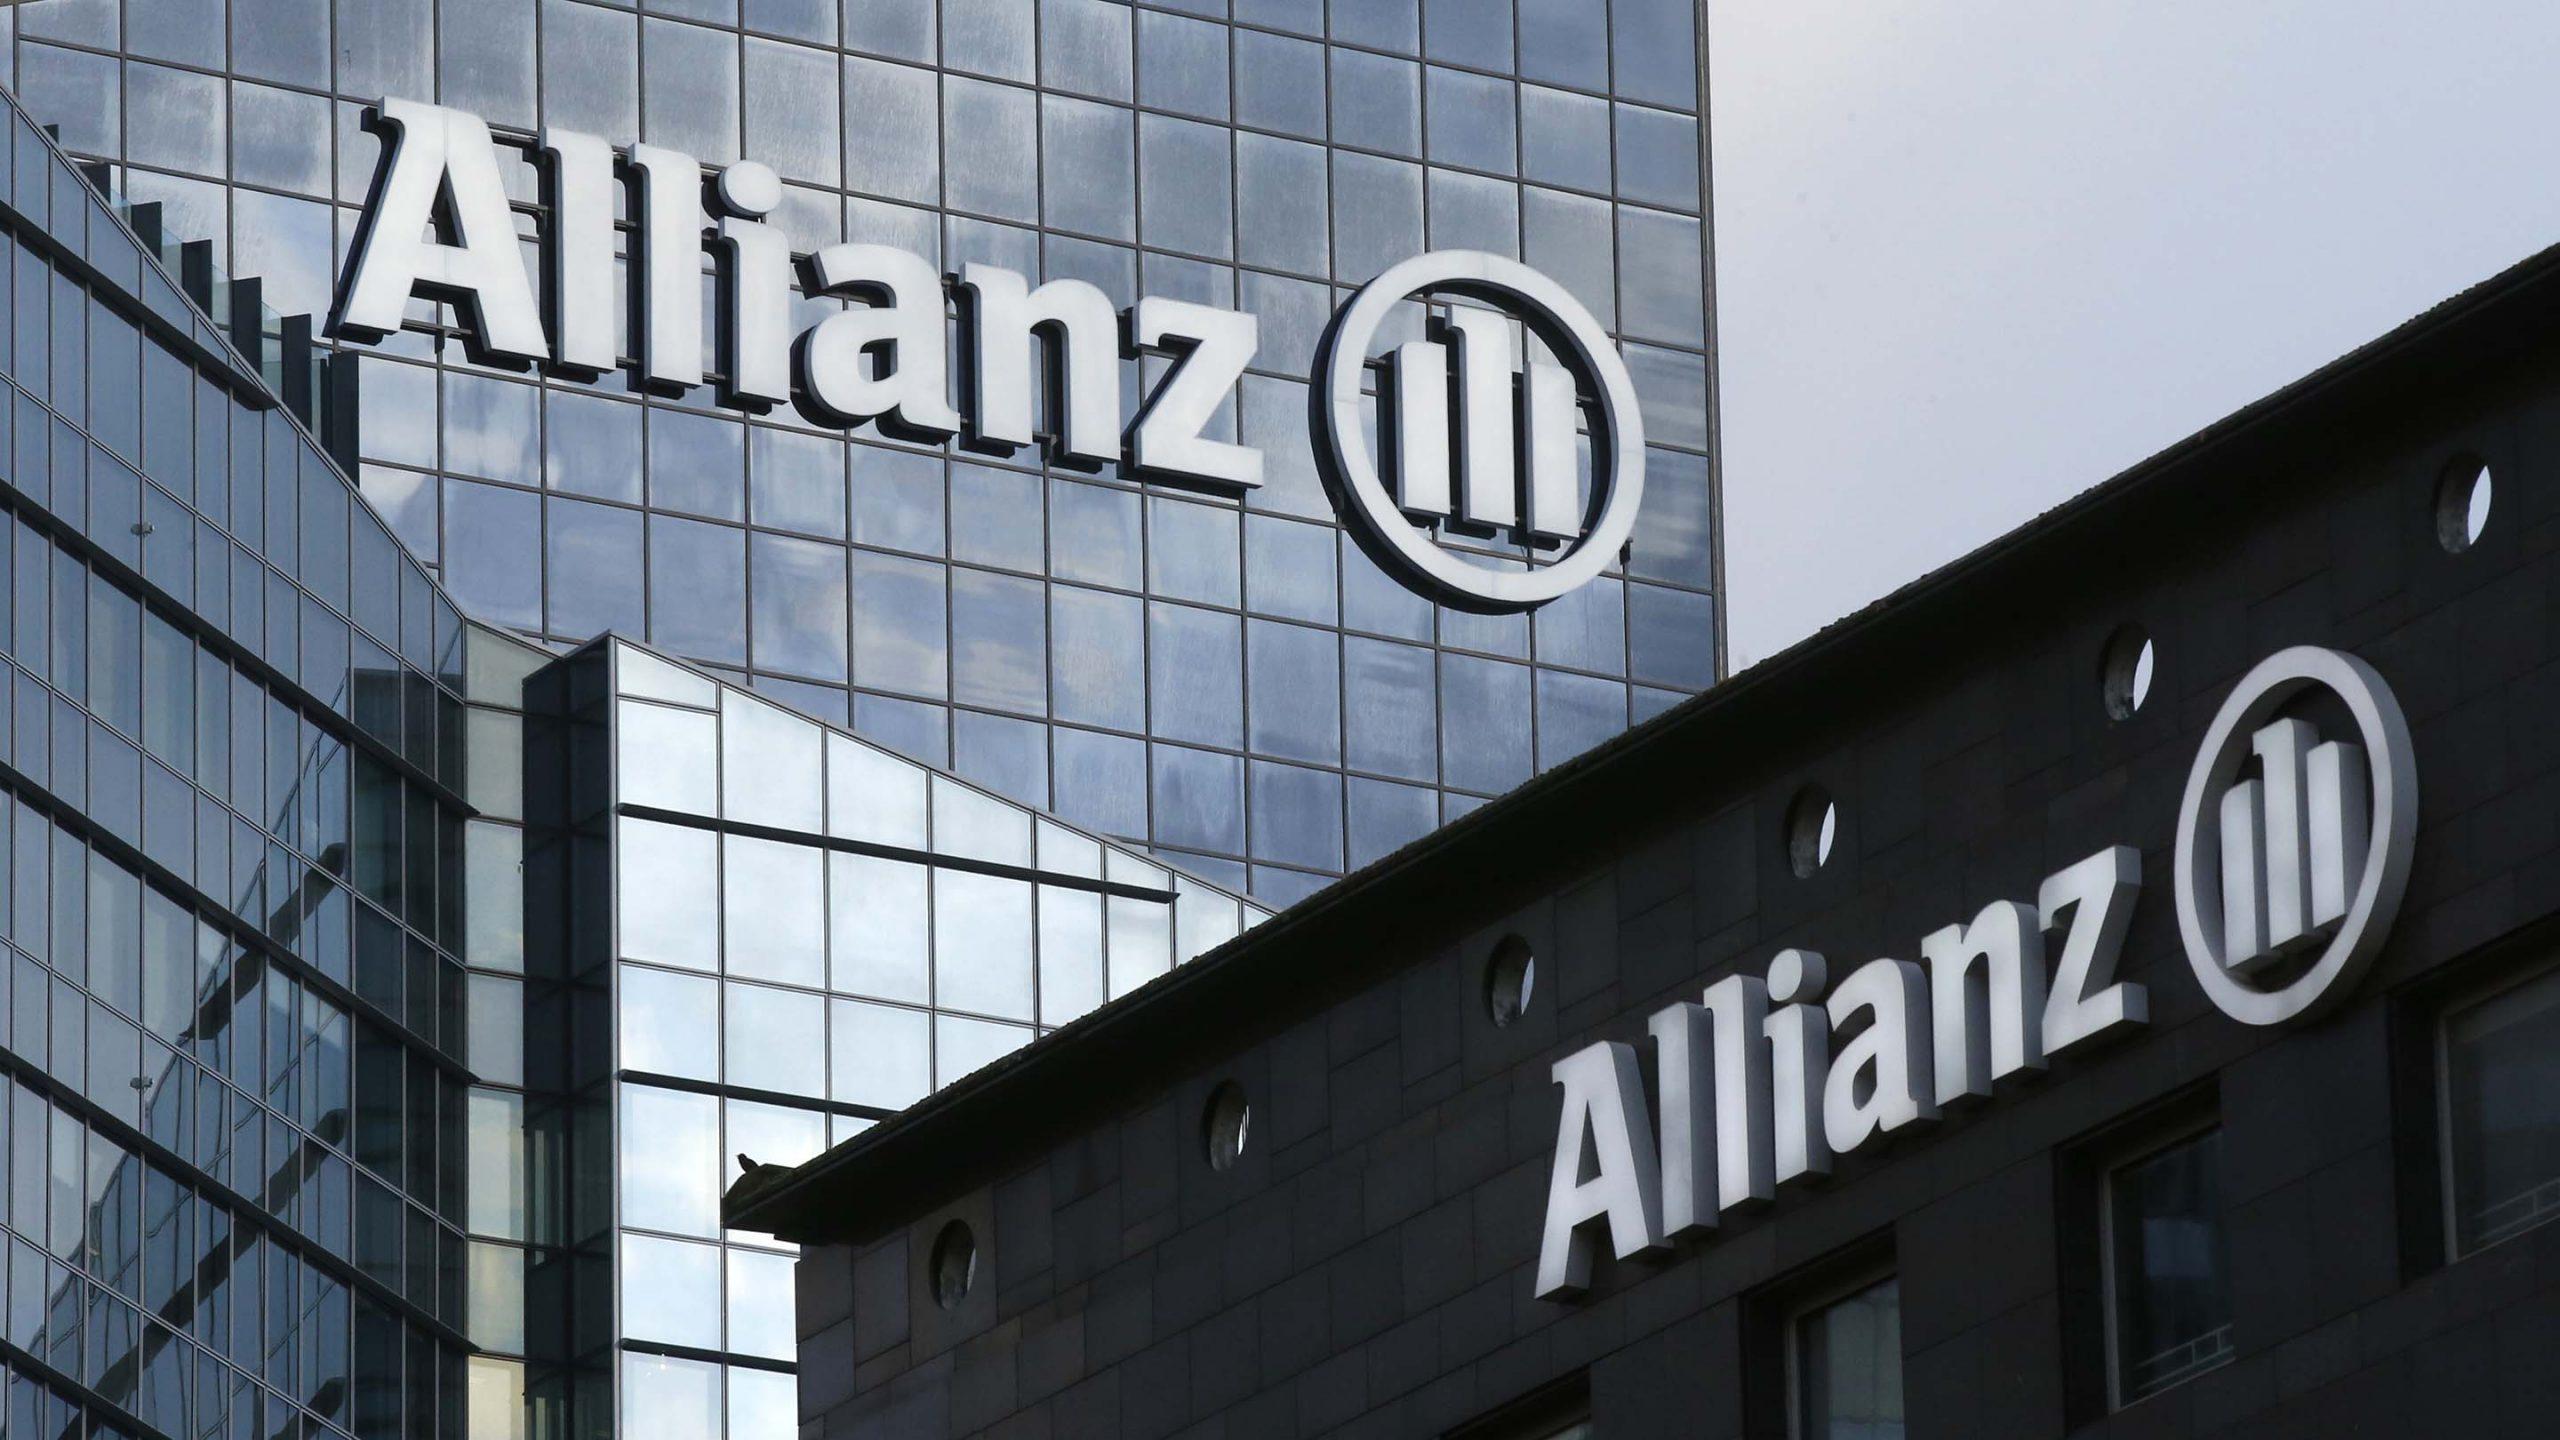 fastnet-service-facility-management-allianz-imm-3